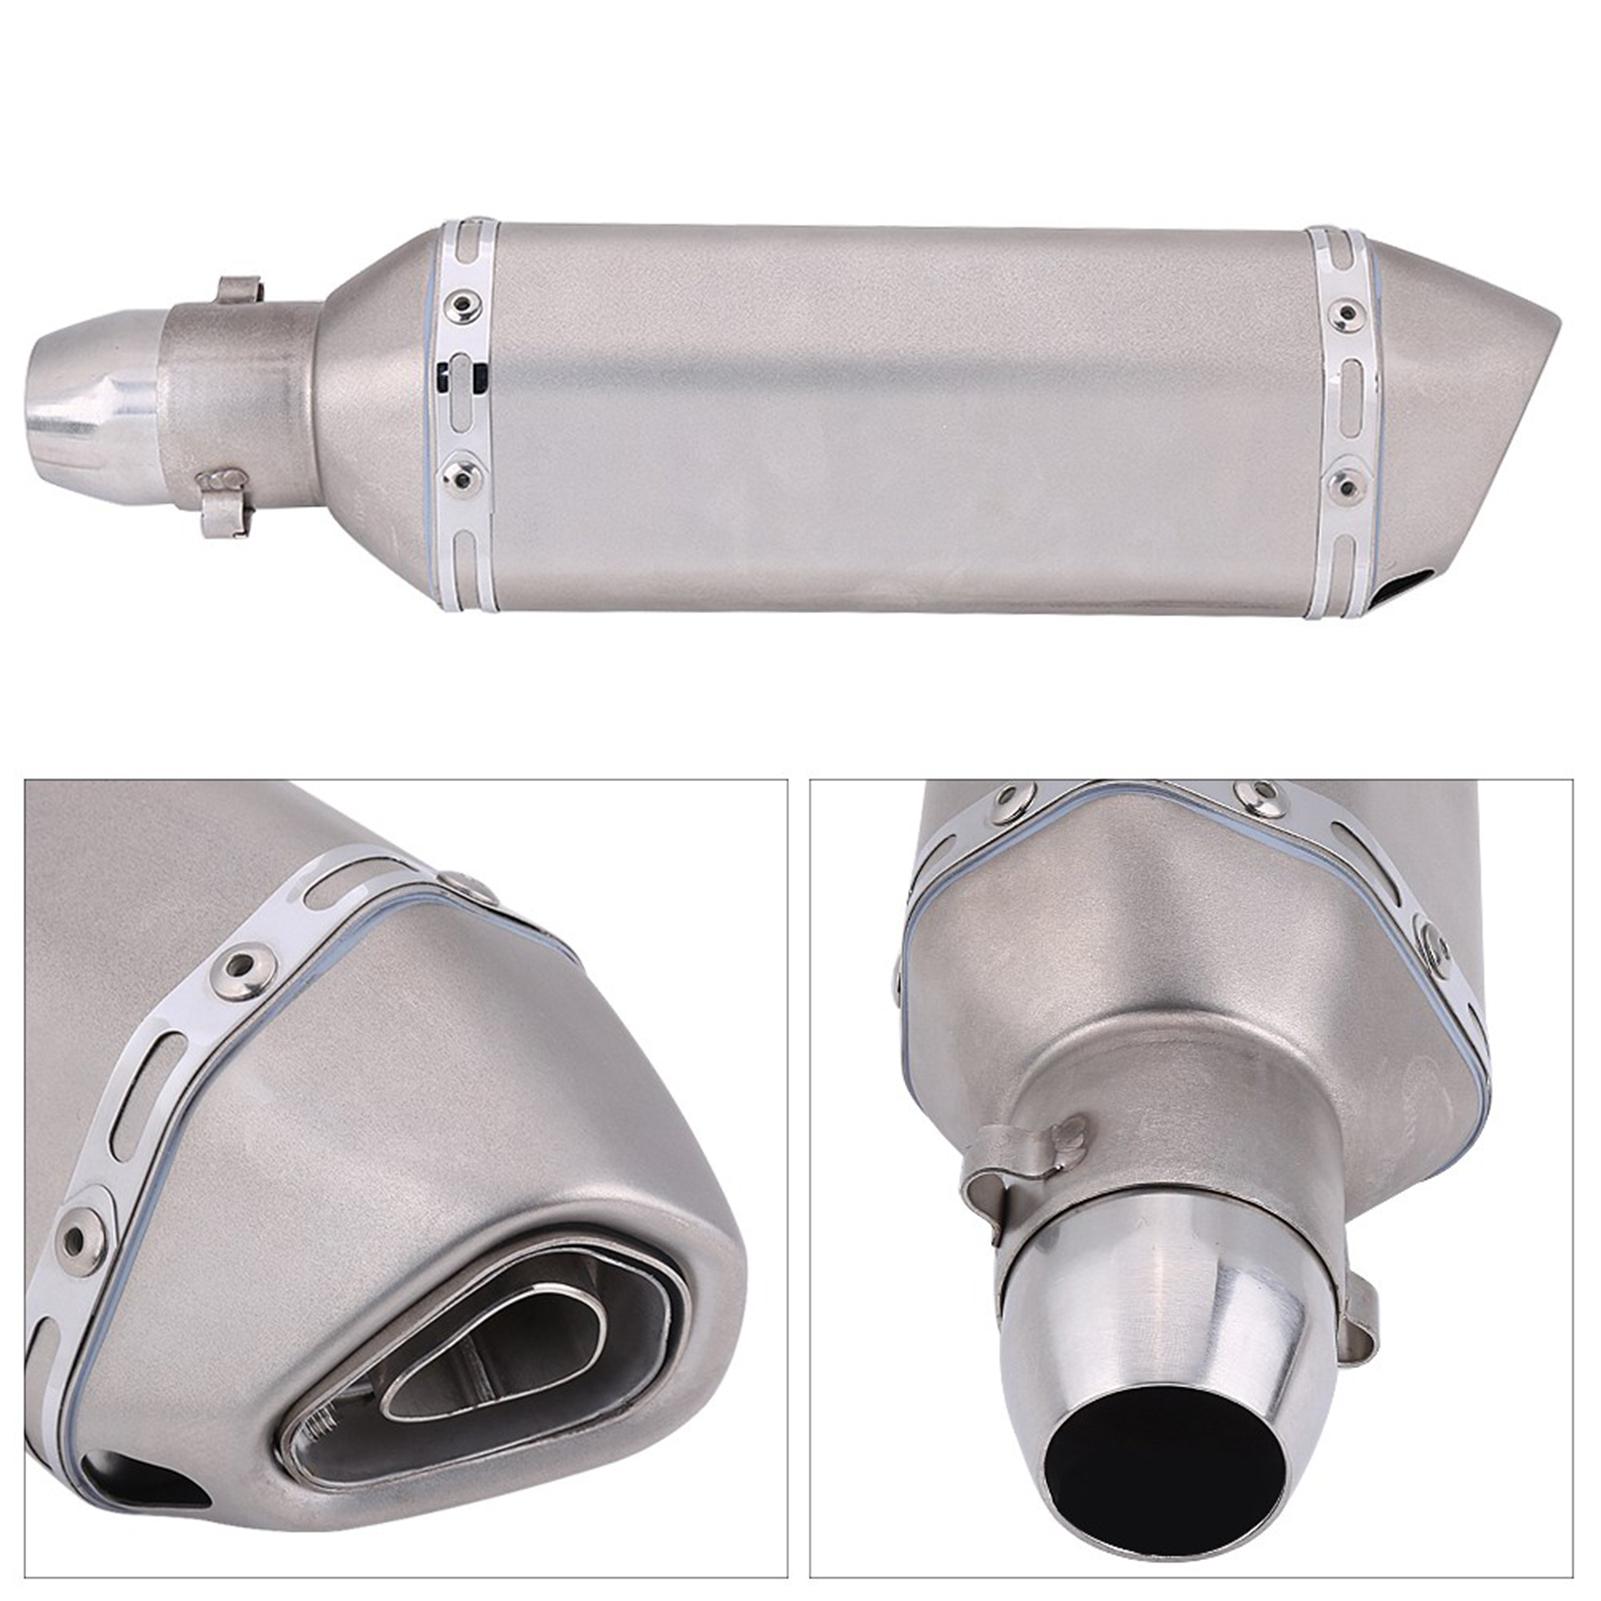 Universal-Moto-Tubo-De-Escape-Cola-De-Silenciador-Acero-Inoxidable-Con-DB-Killer miniatura 56